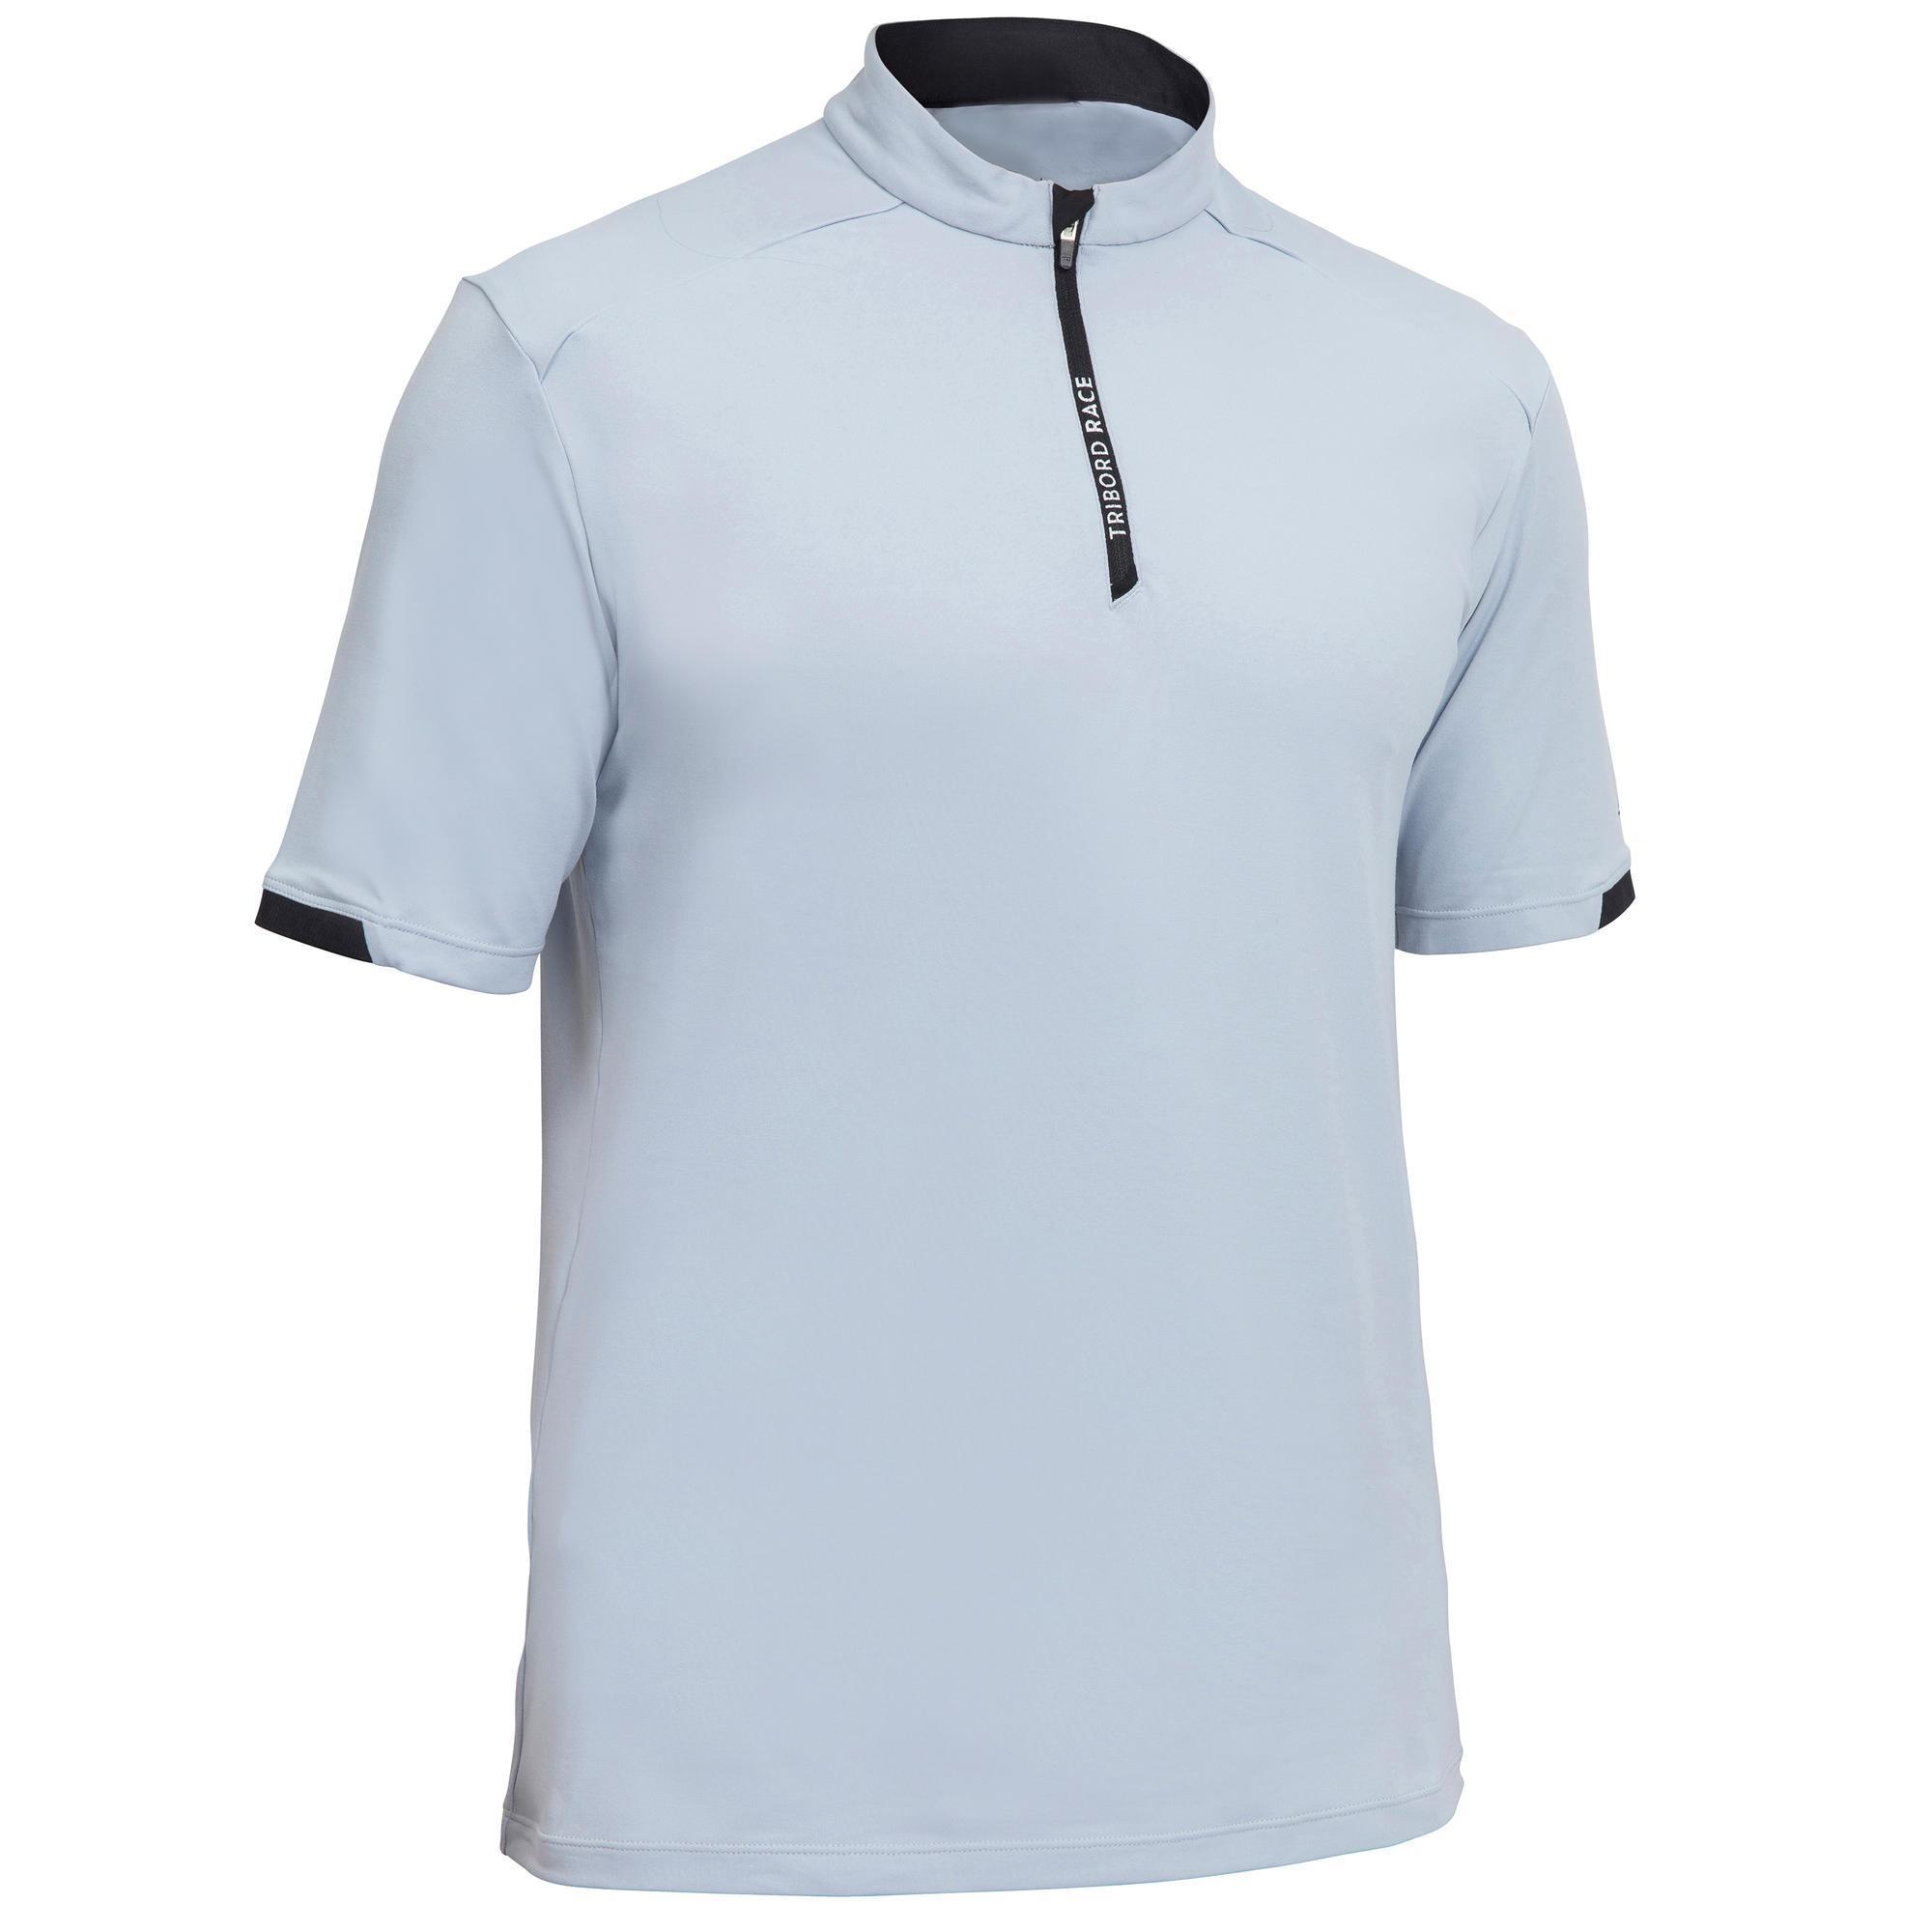 ca86d830f404 T-shirts Homme